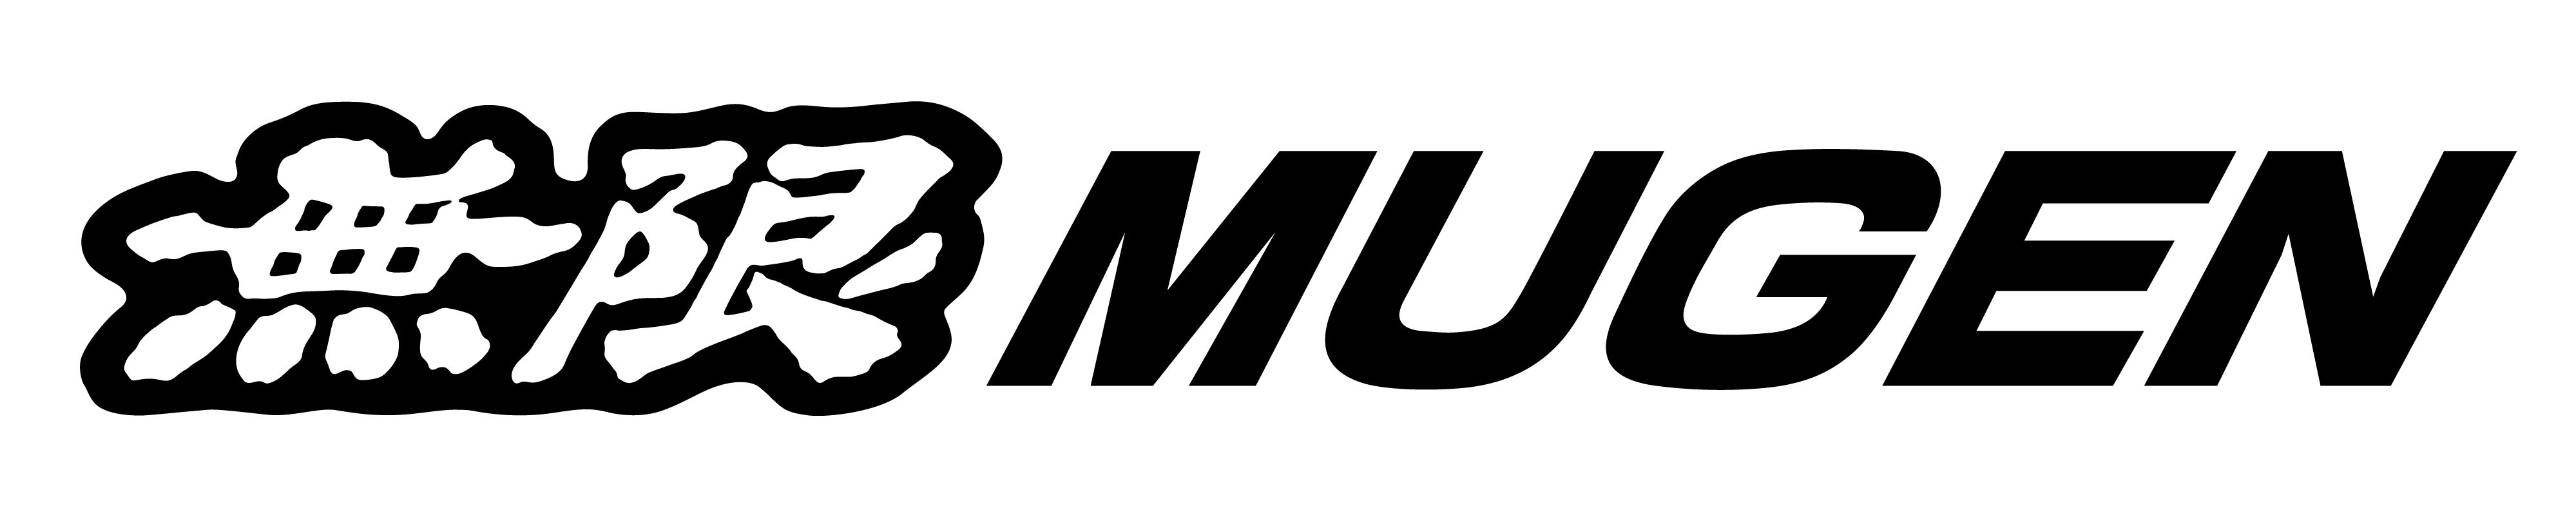 mugen logos honda logo png transparent honda logo png file